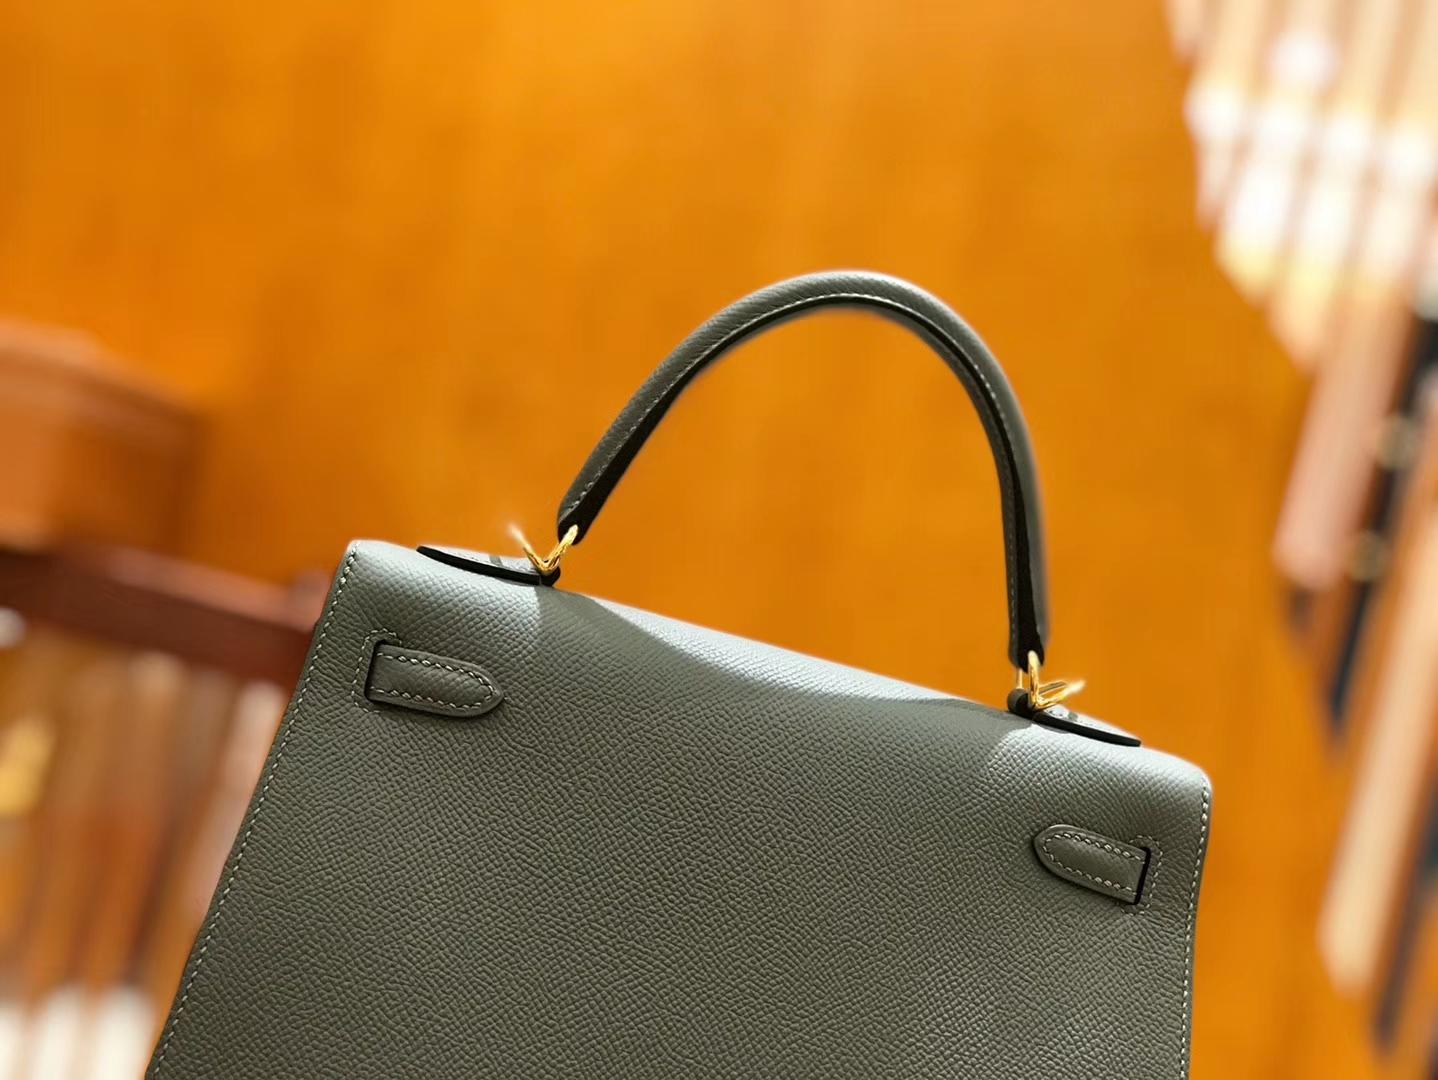 Hermès(爱马仕)Kelly 25cm 杏仁绿 金扣 掌纹牛皮 全手工缝制